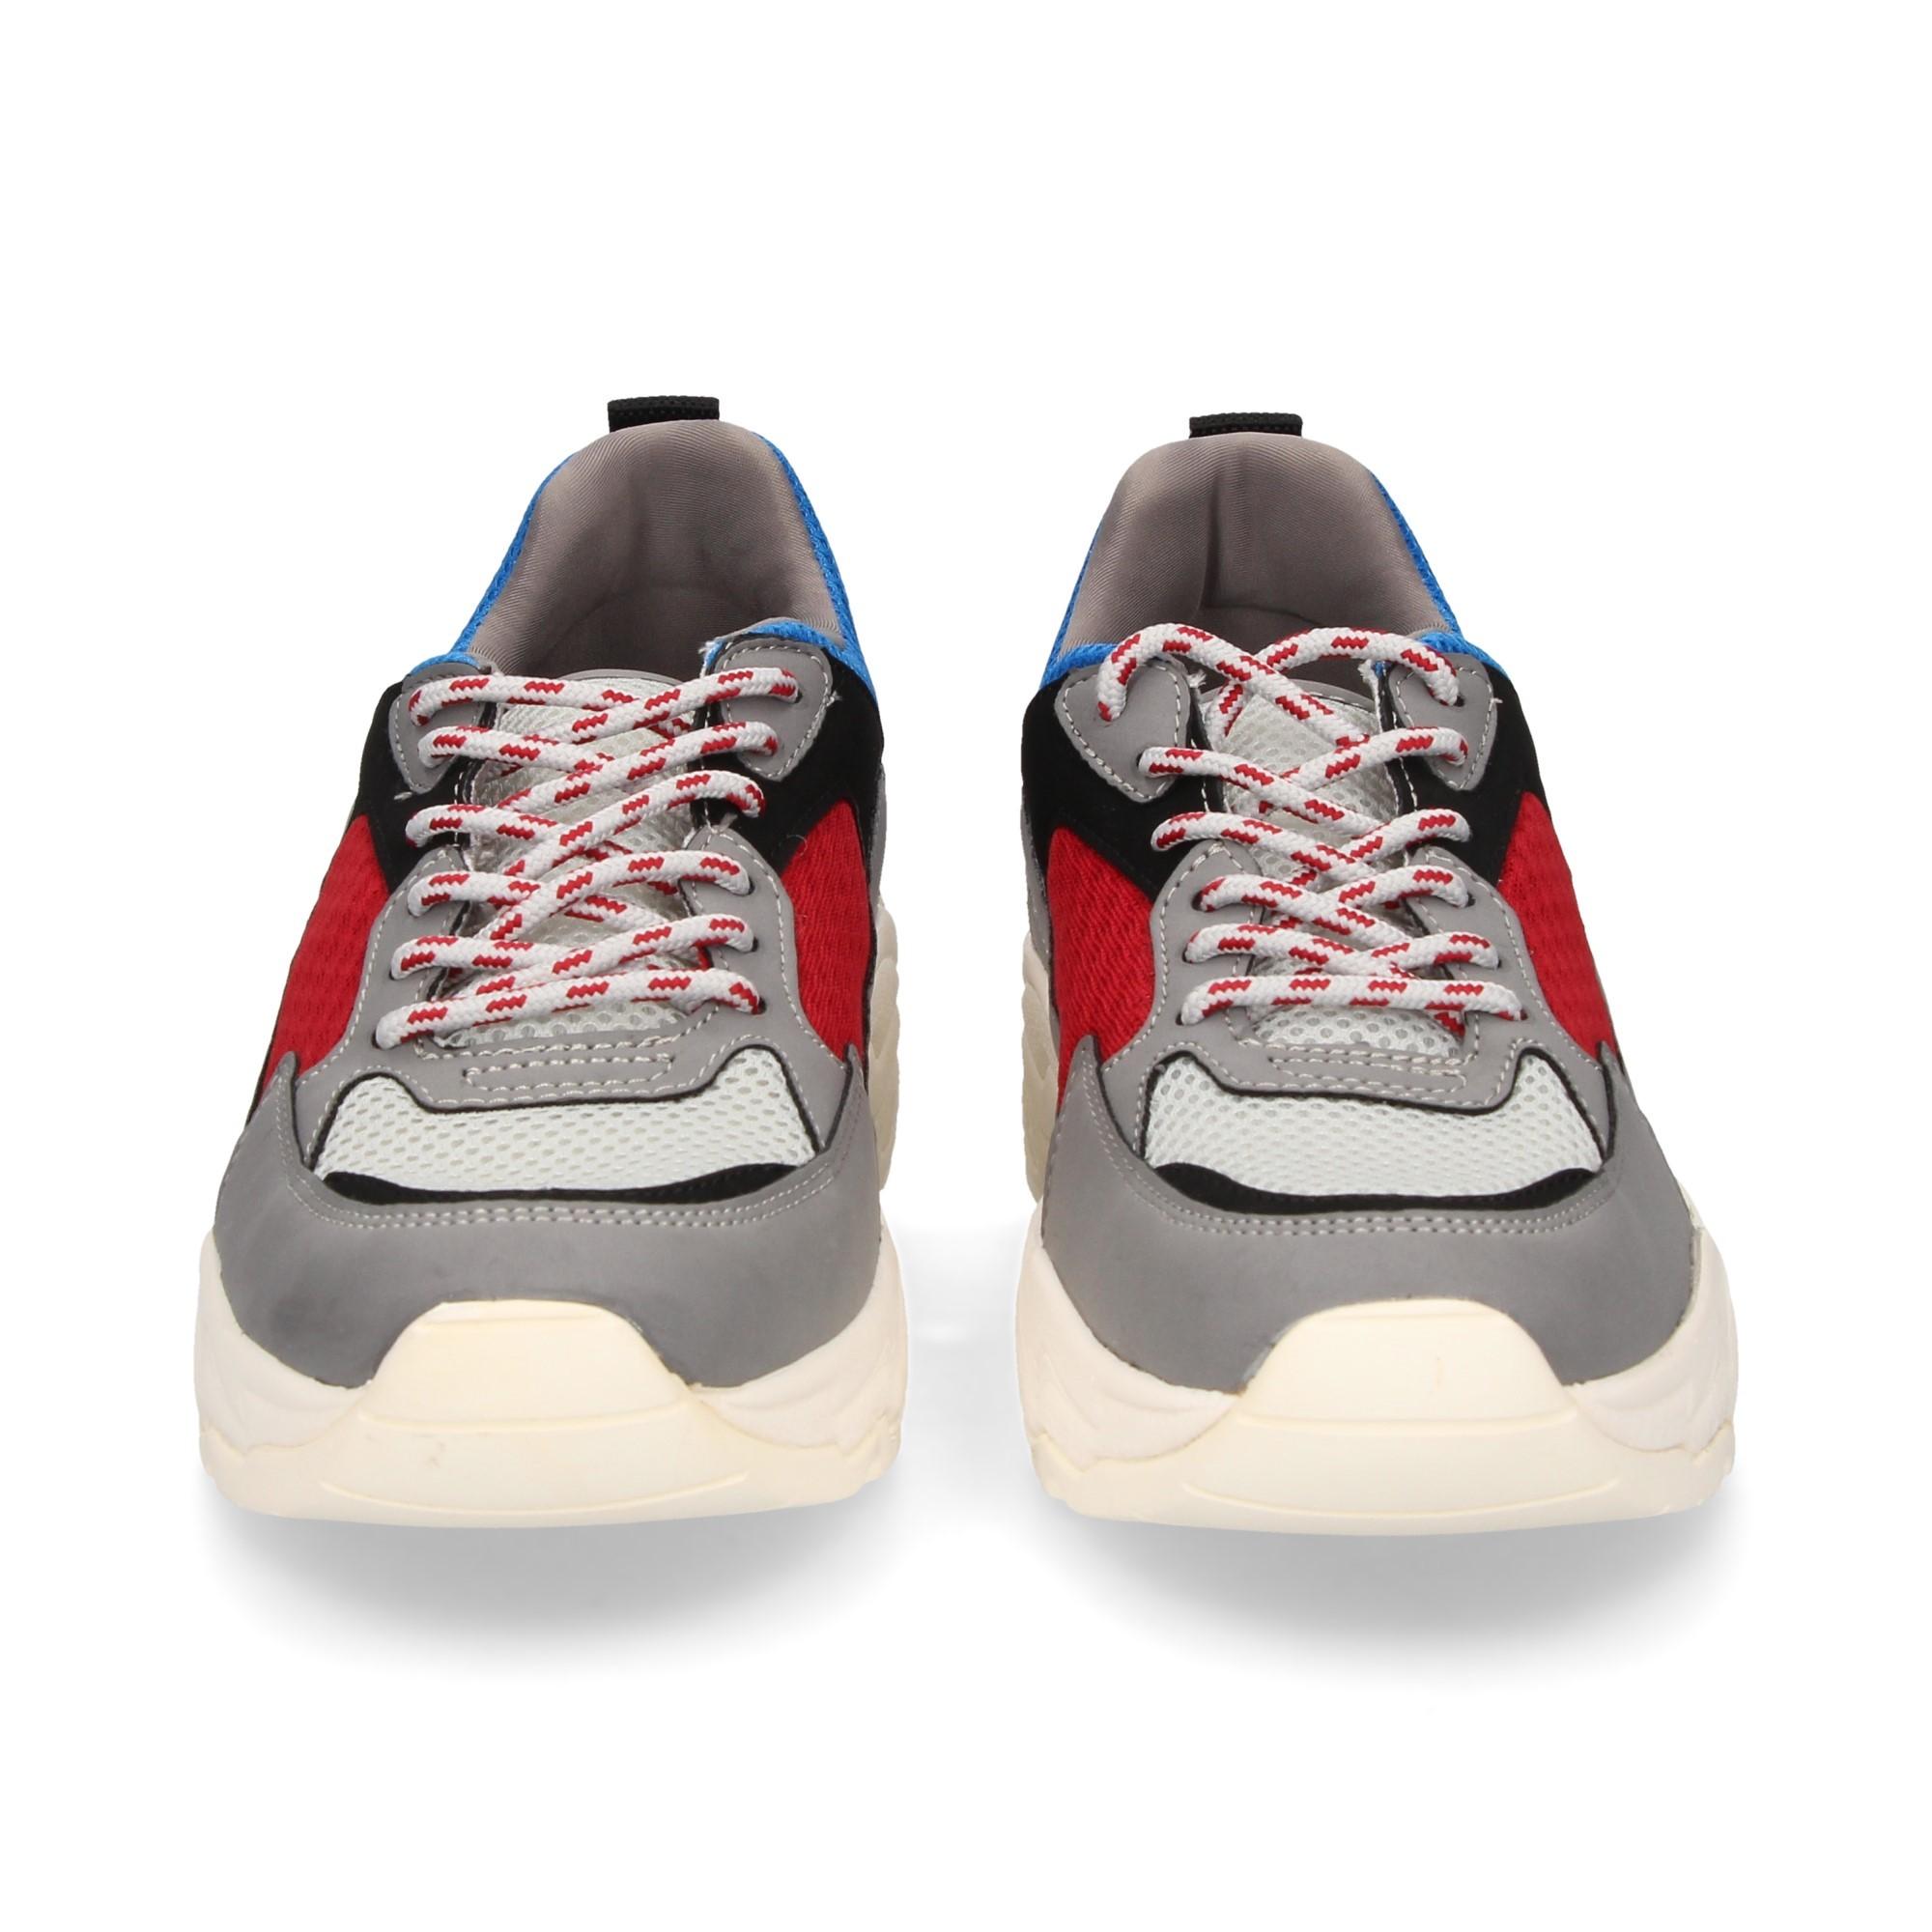 deportivo-acordonado-textil-multi-gris